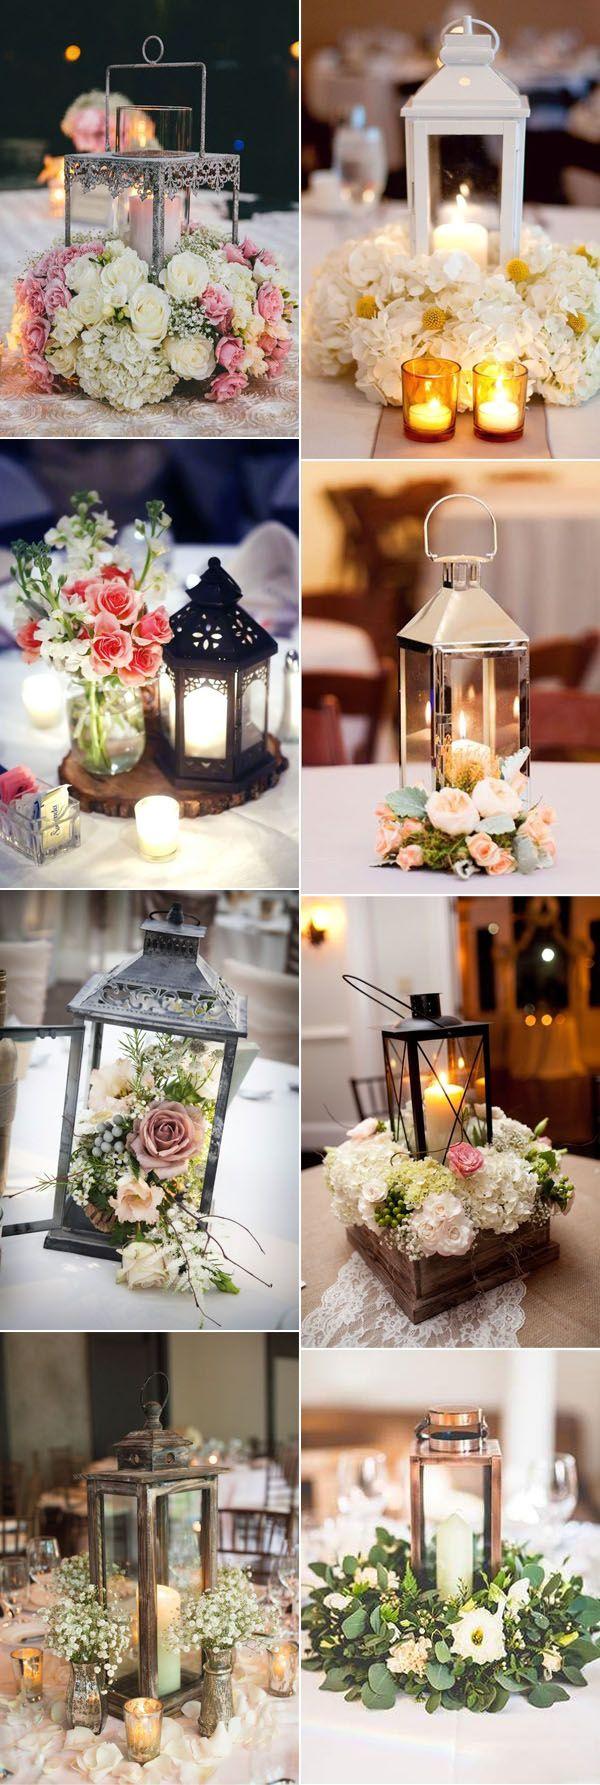 Perfect 35 Centerpieces for 2017 Wedding Ideas | Wedding ...